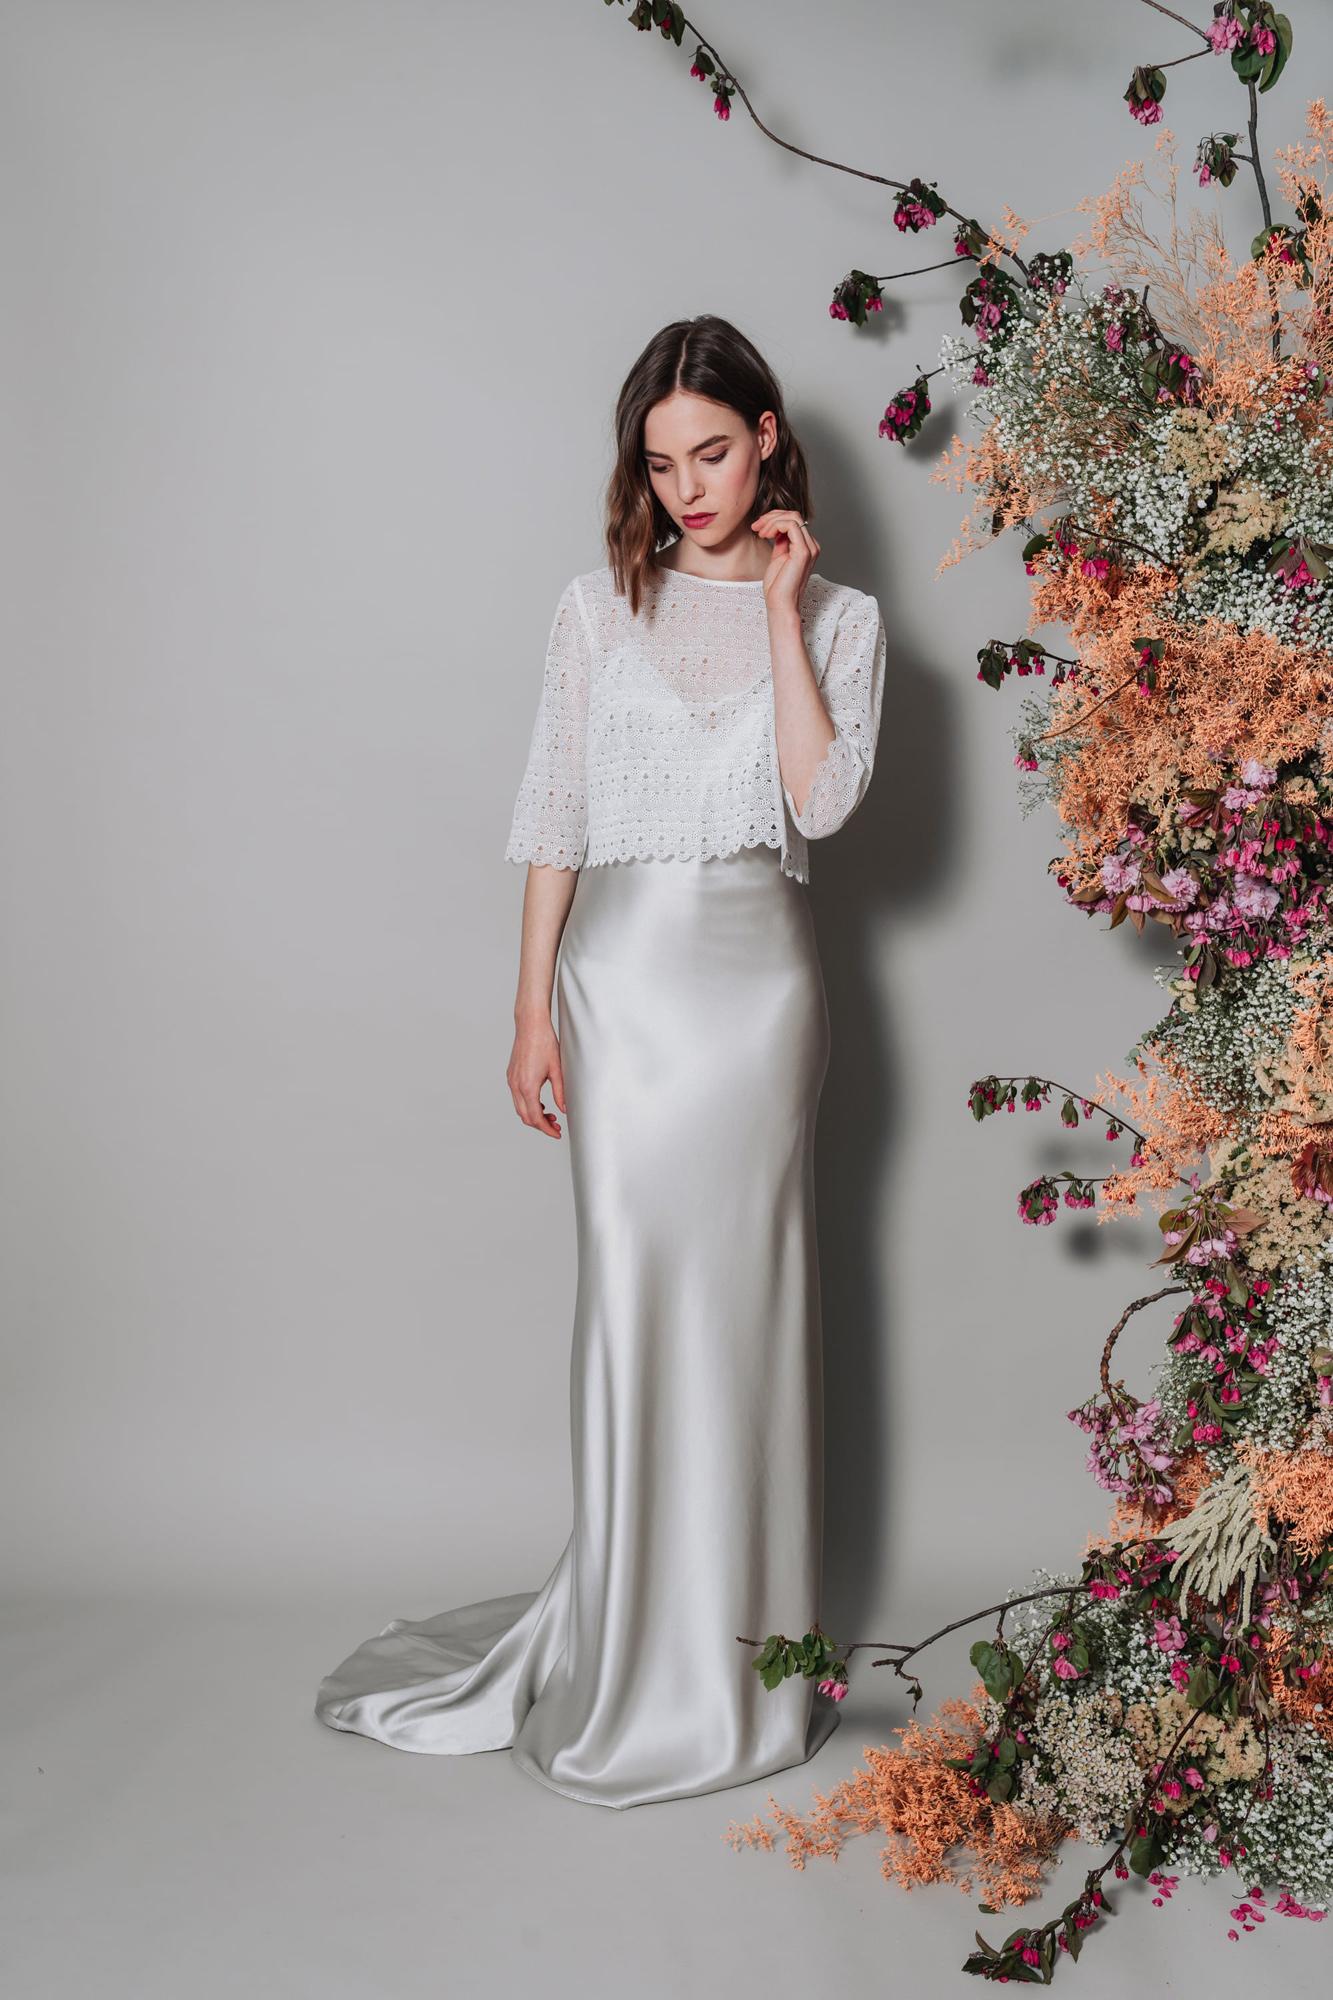 Kate-Beaumont-Sheffield-Freesia-Guipure-Lace-Jacket-Cosmos-Bias-Cut-Silver-Silk-Wedding-Gown-1.jpg